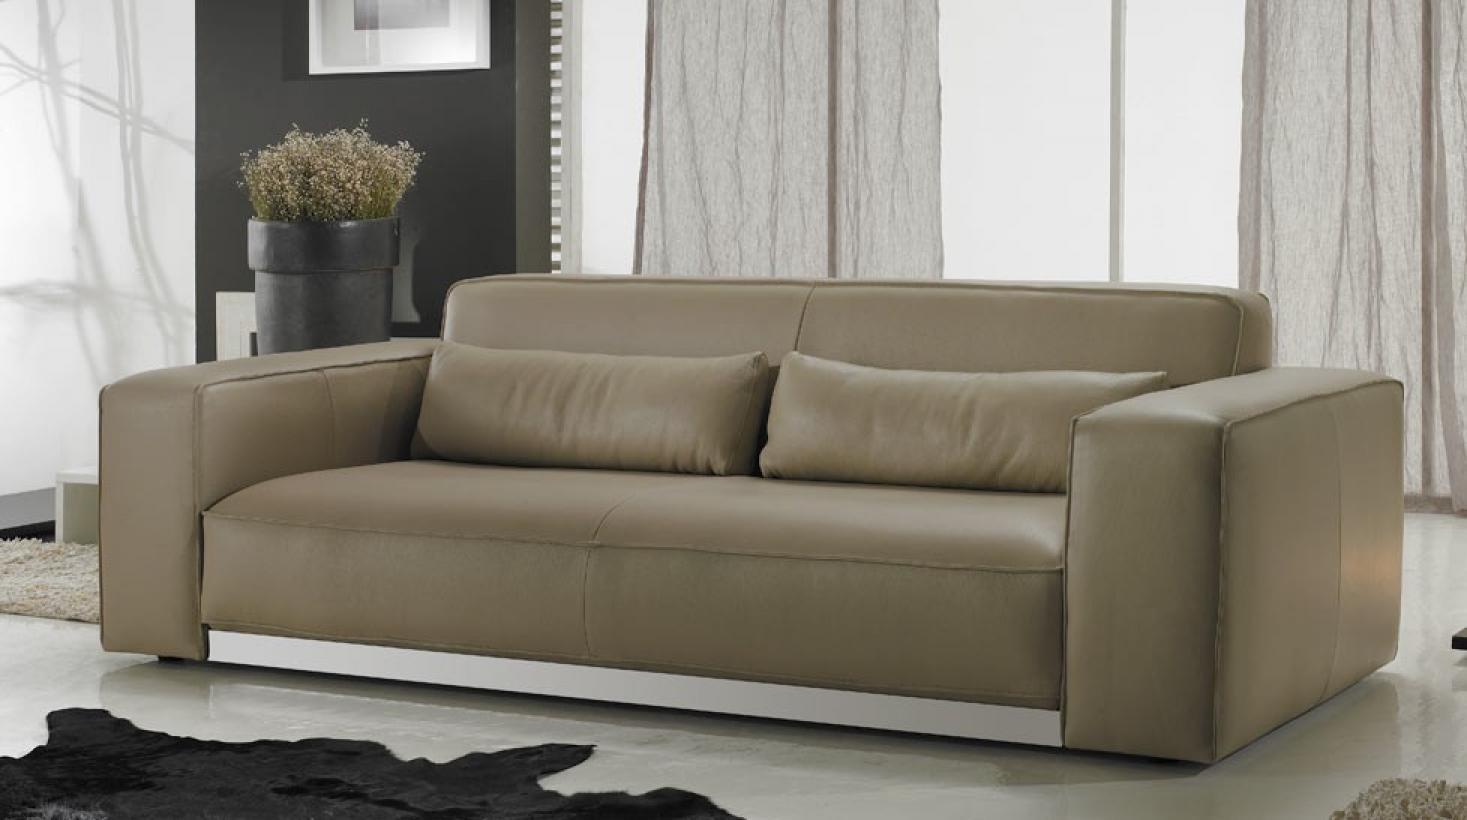 photos canap design italien pas cher. Black Bedroom Furniture Sets. Home Design Ideas